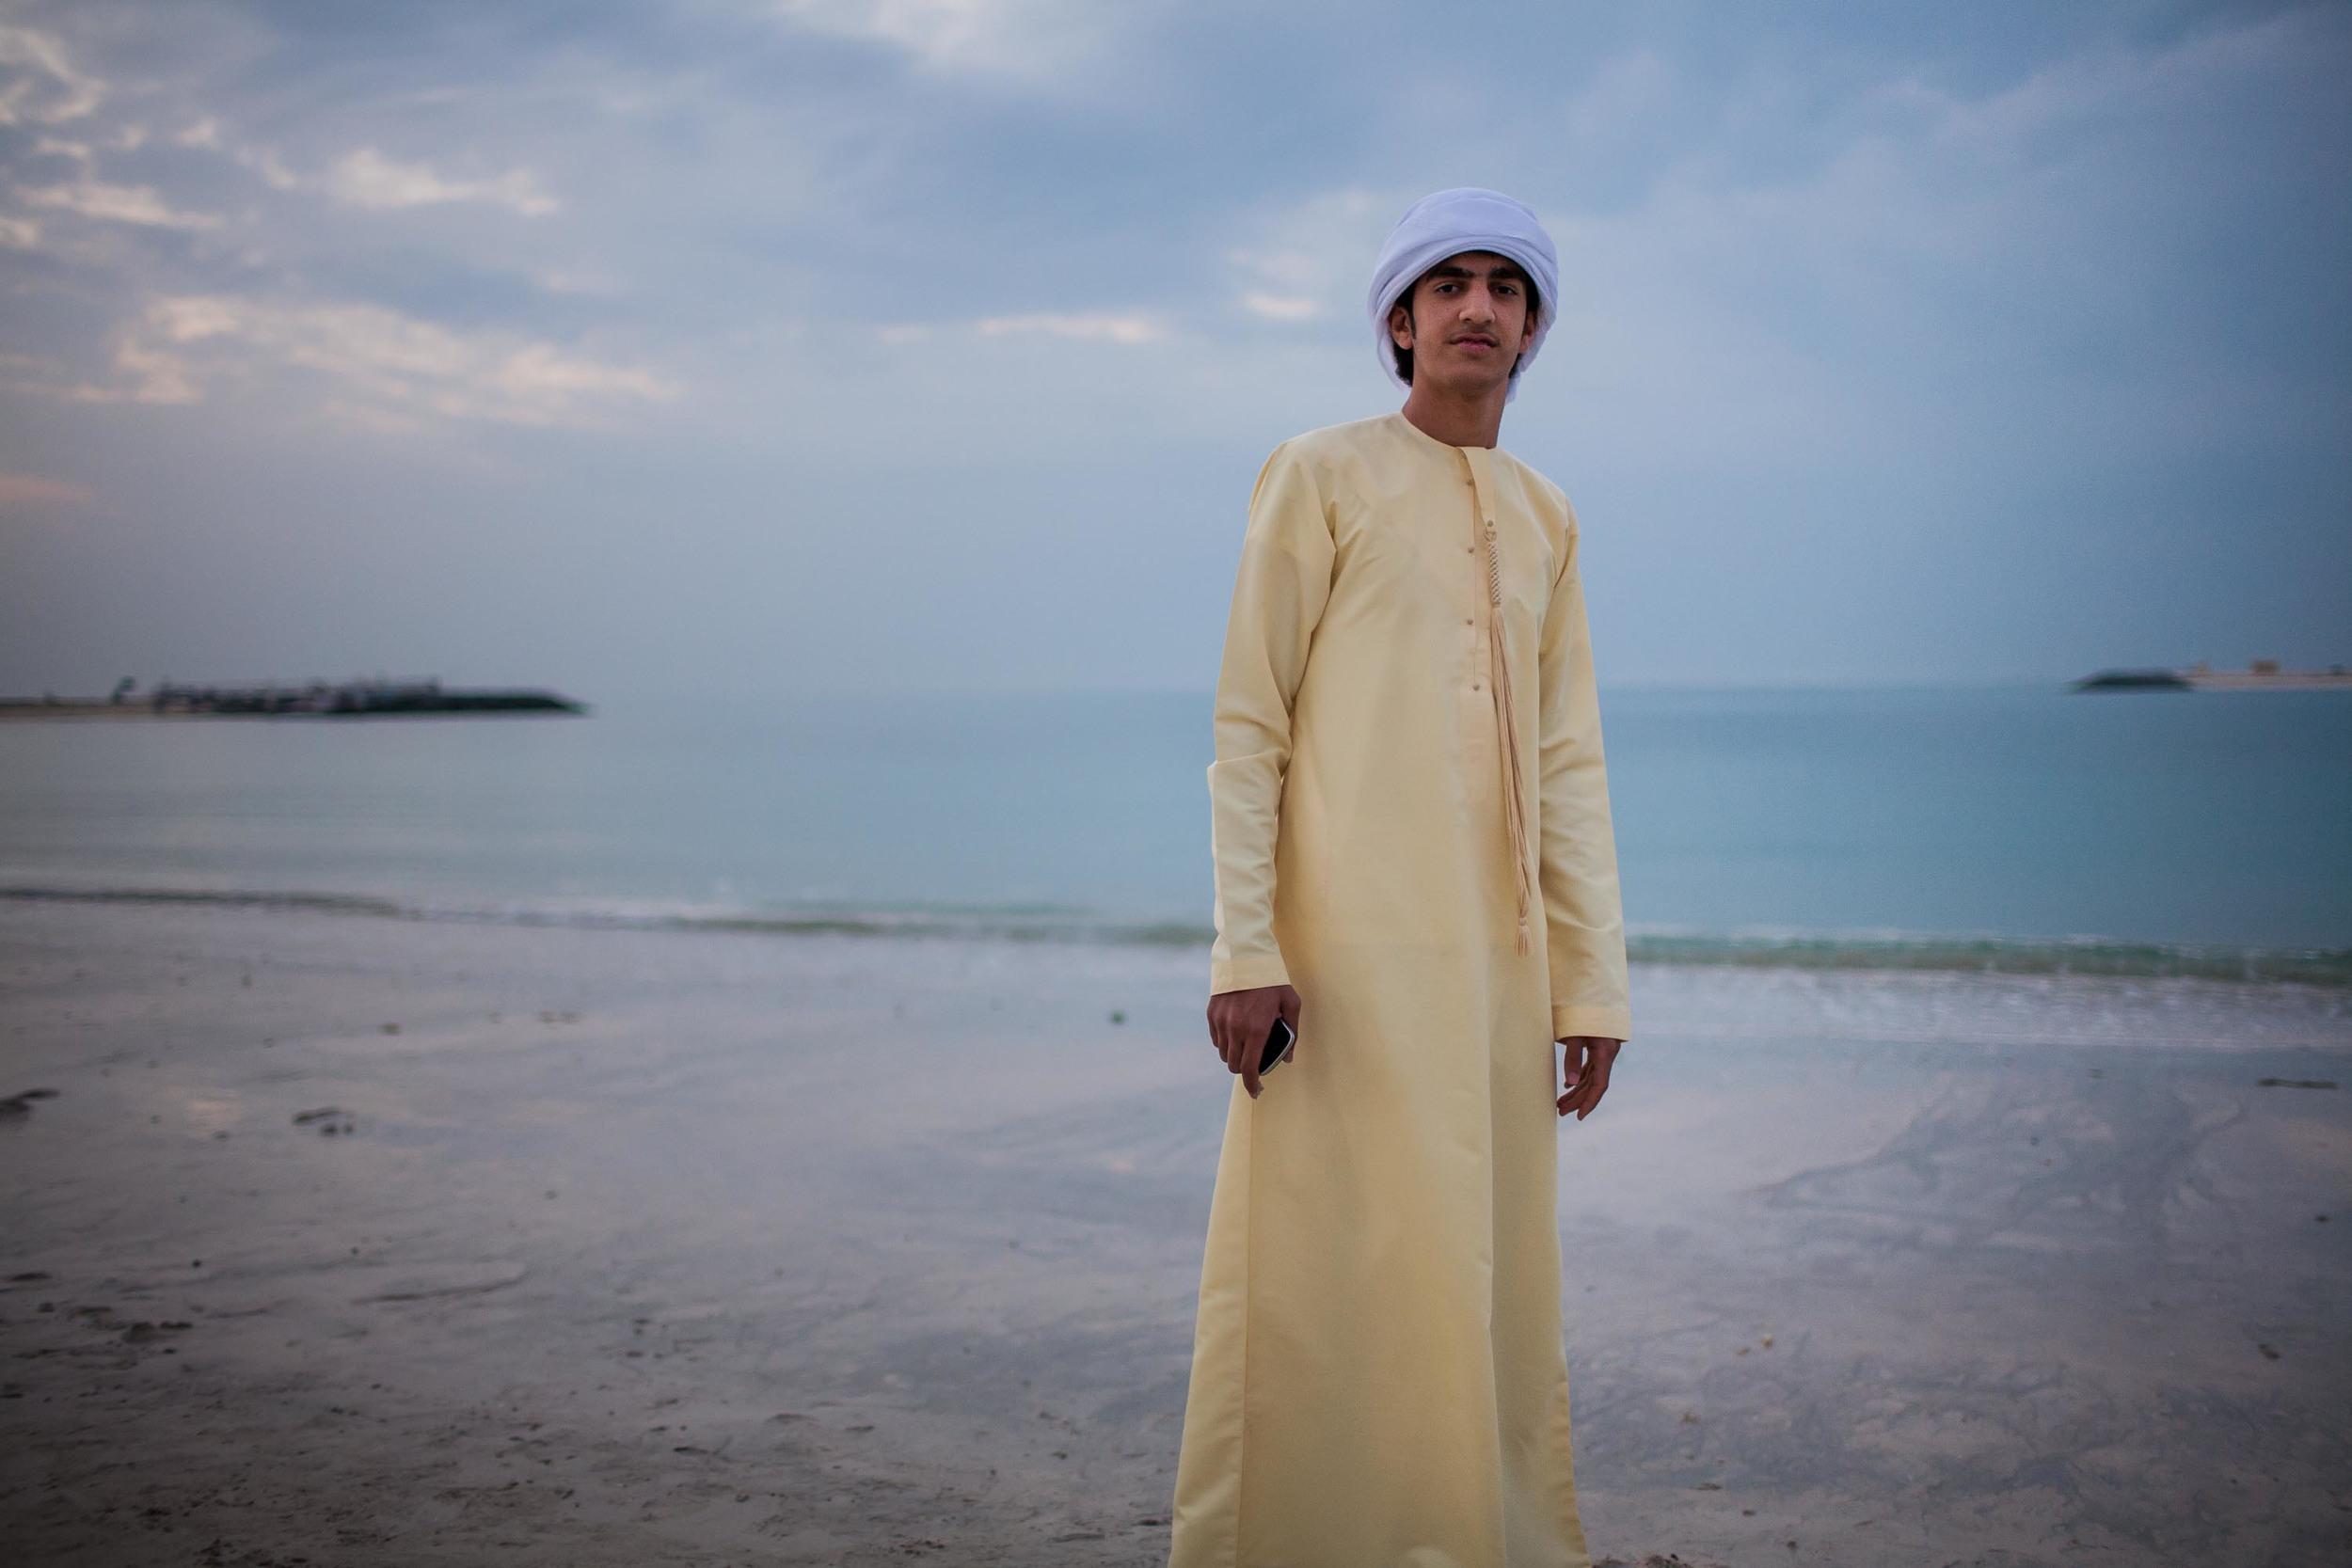 bryce-johnson-photography-actor-world-travel-explorer-photo-37.jpg